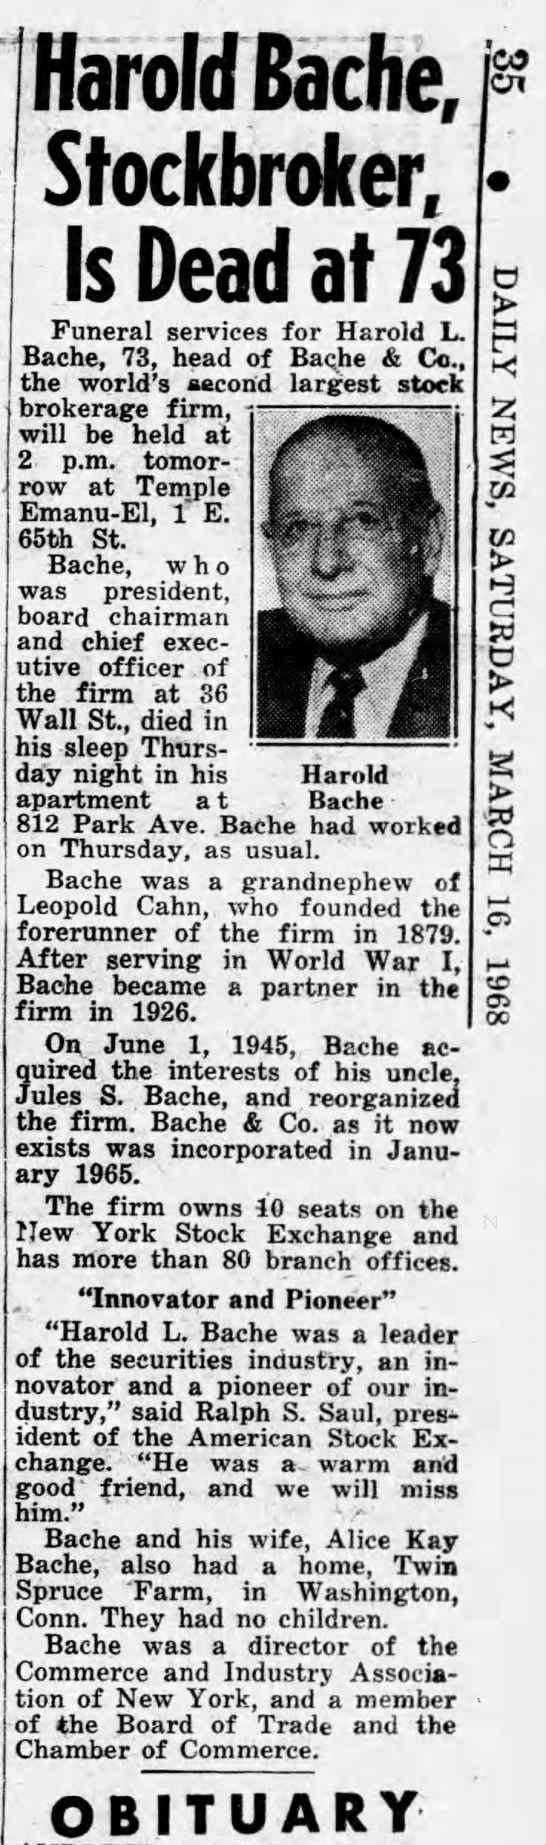 Obituary for Harold L. Bache (Aged 73) -